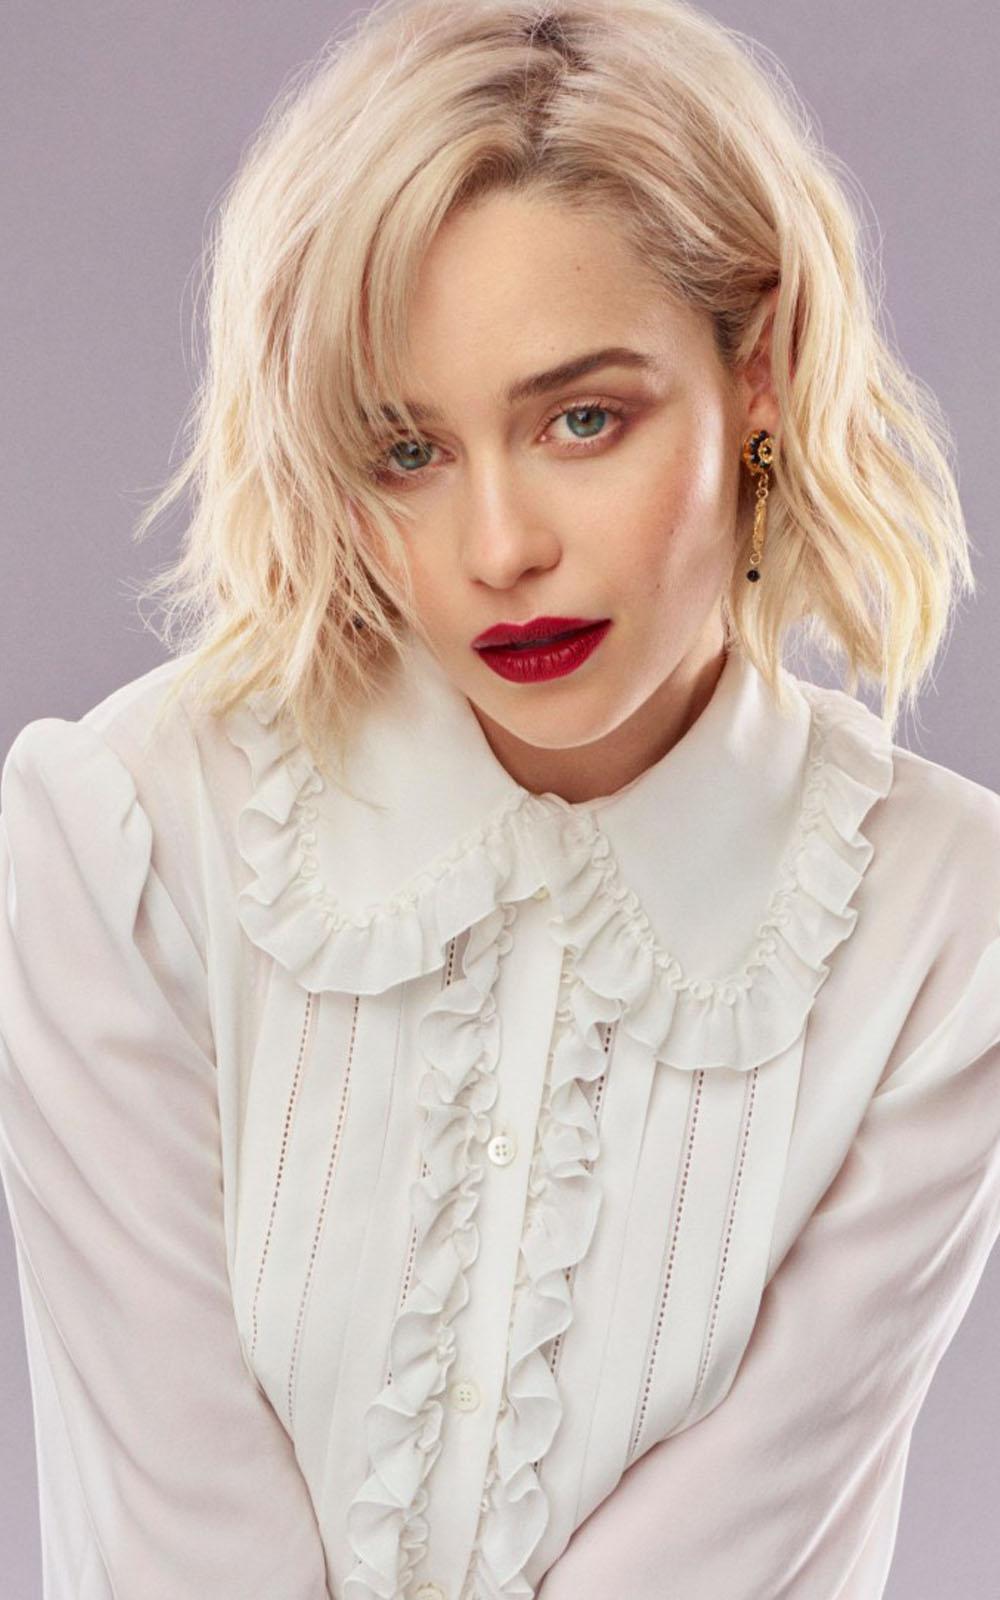 Siege Girls Anime Wallpaper Download Emilia Clarke 2018 Photoshoot Free Pure 4k Ultra